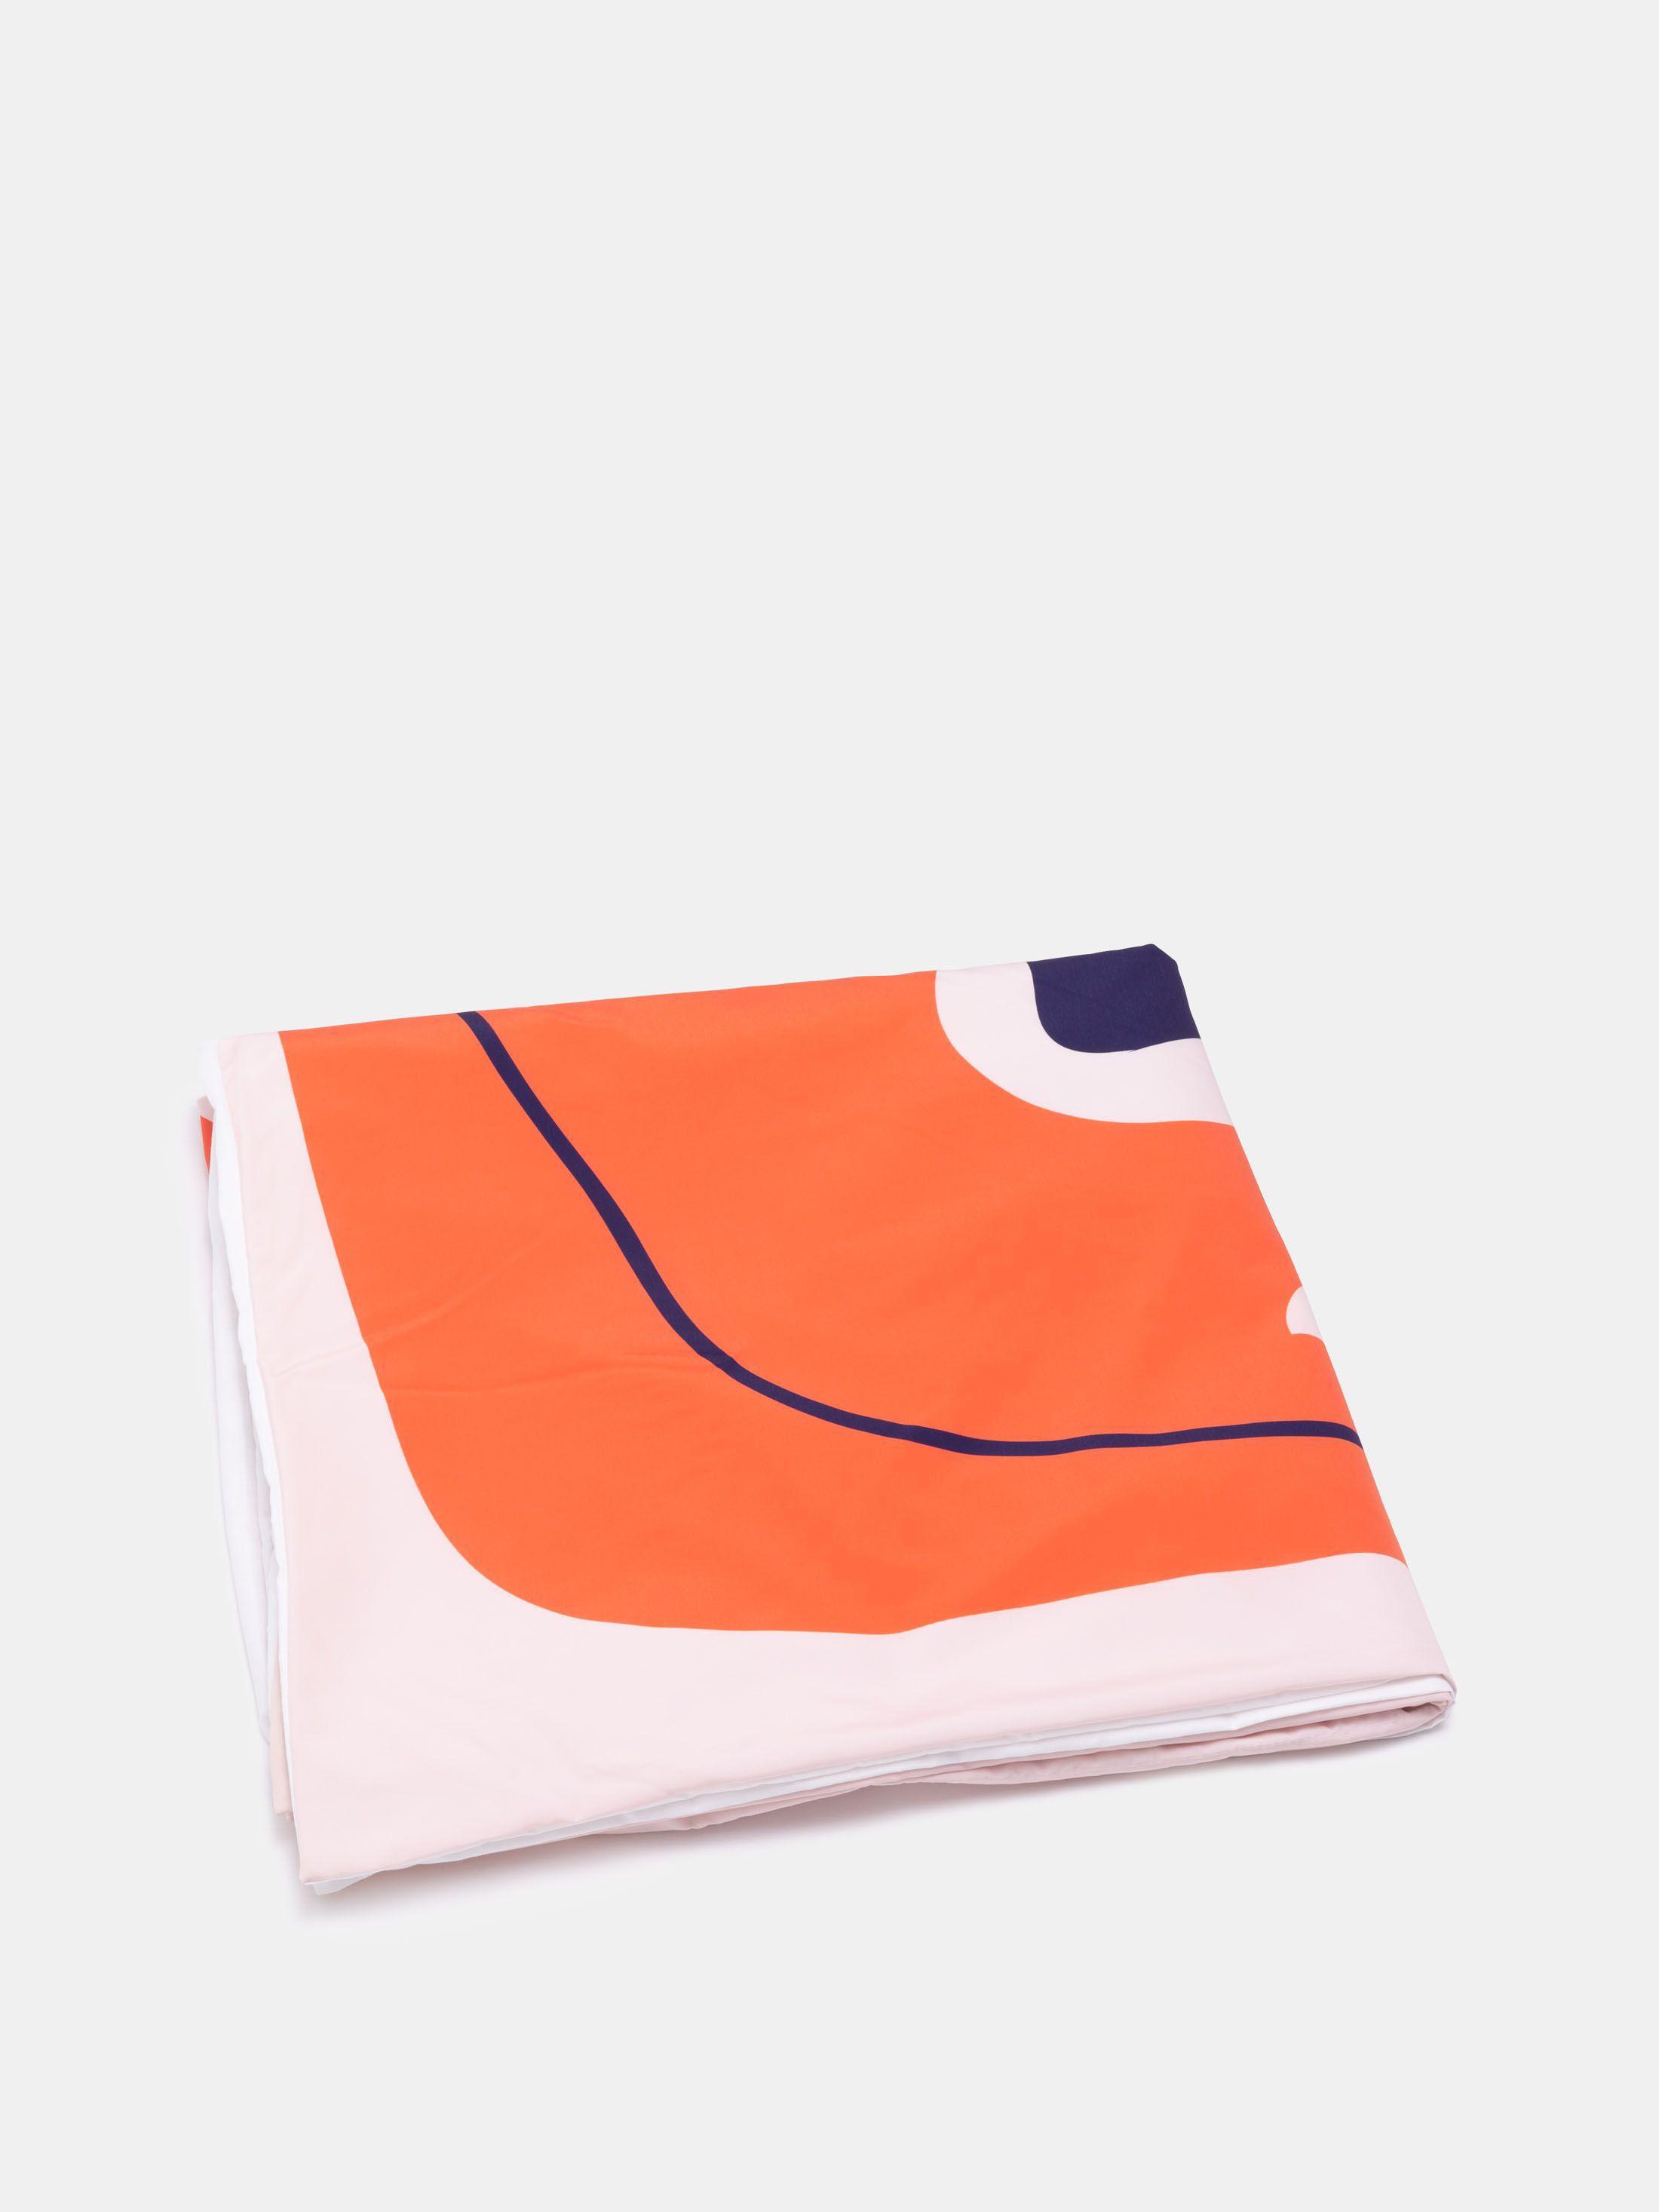 Design Your Own Duvet Cover